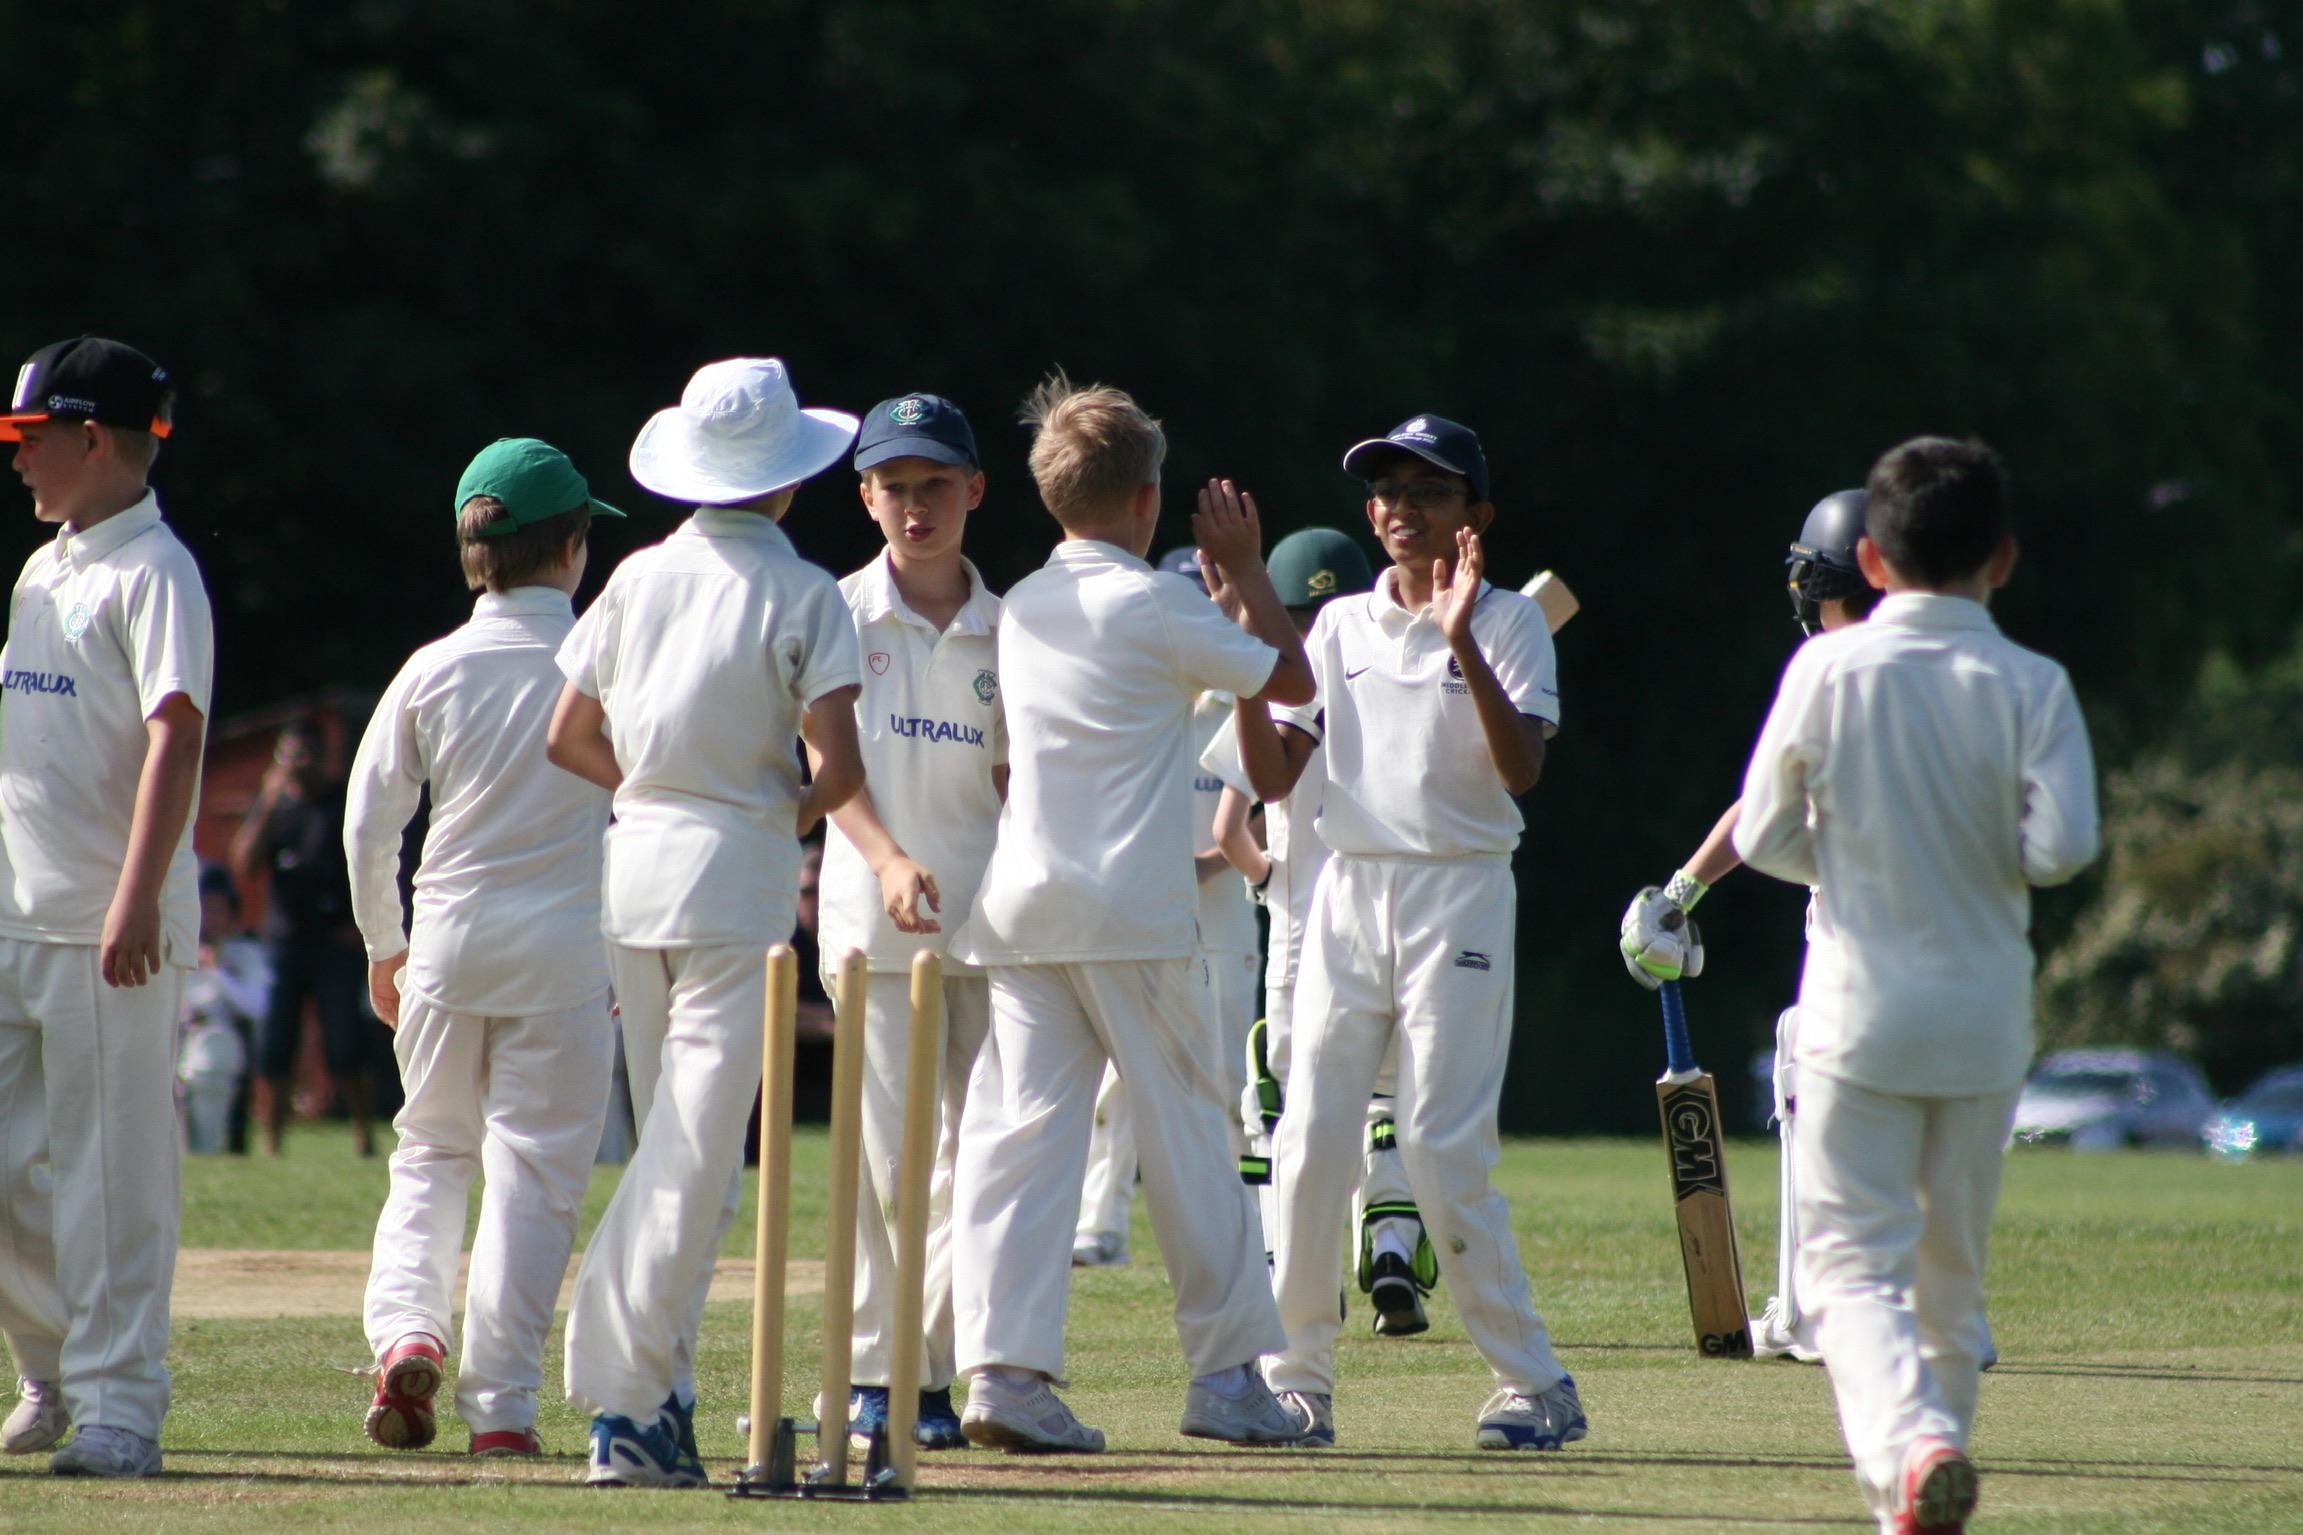 Under 11s celebrate a wicket